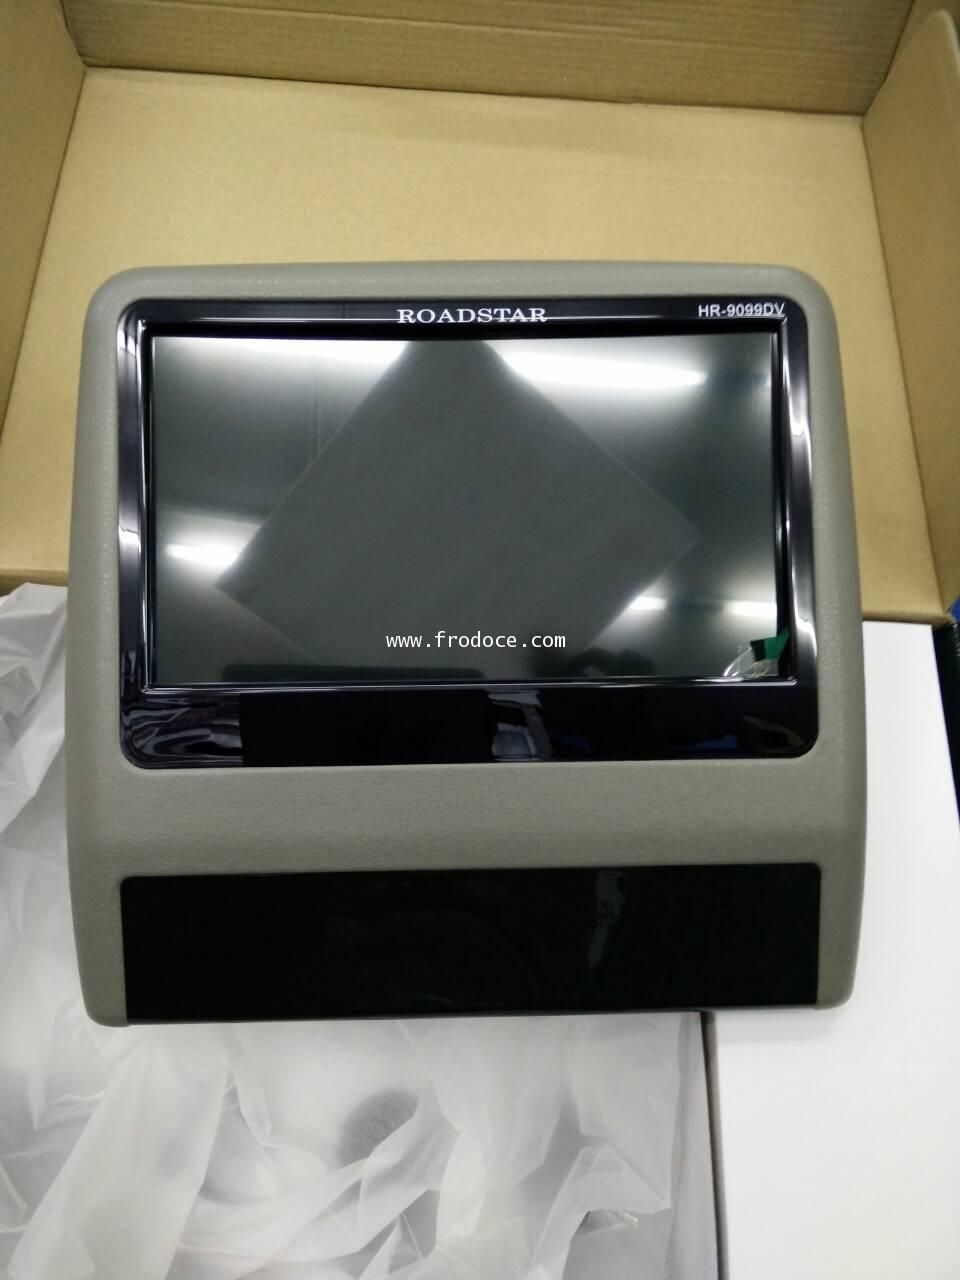 ROADSTAR HR-9099DV 1